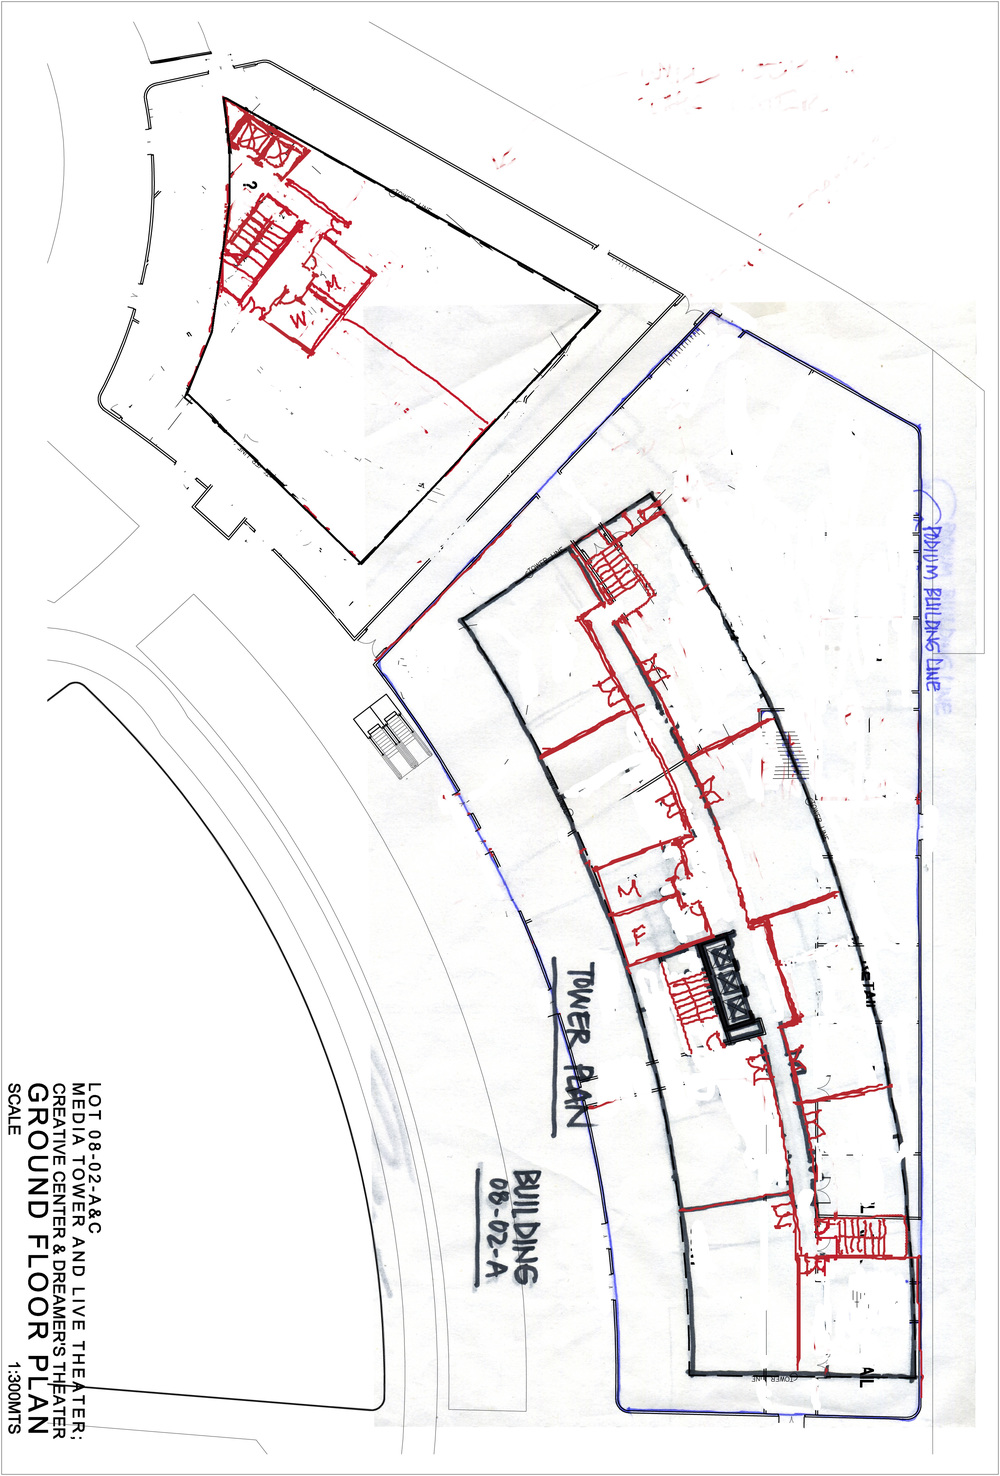 08-02-A&C-PODIUM PLAN_offices.jpg